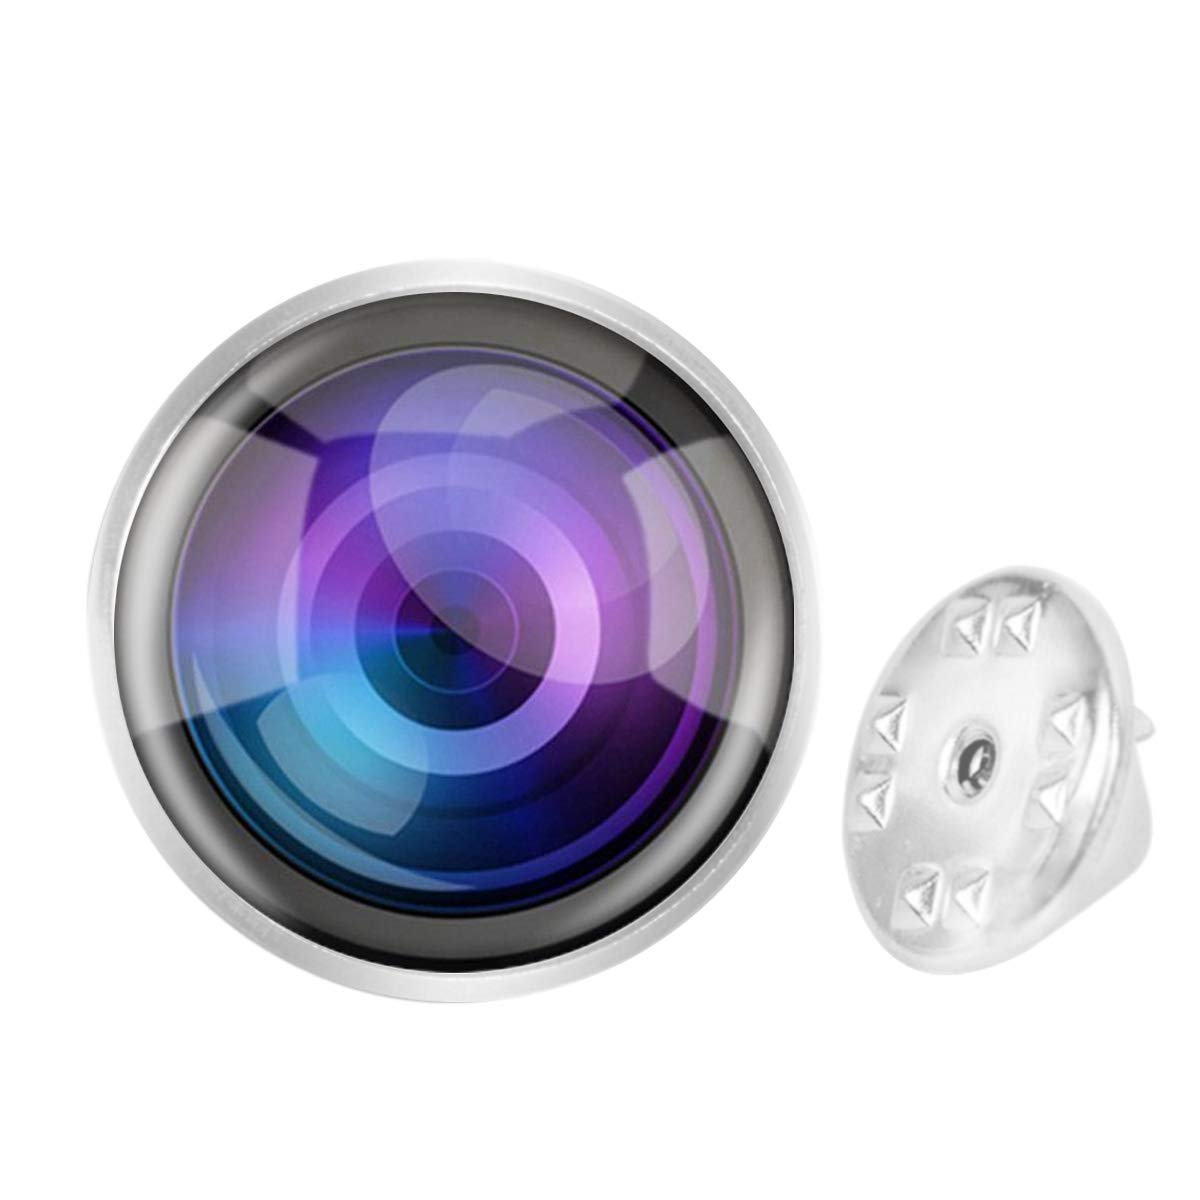 WAZZIT Round Metal Tie Tack Hat Lapel Pin Brooches Camera Lens Photo Banquet Badge Enamel Pins Trendy Accessory Jacket T-Shirt